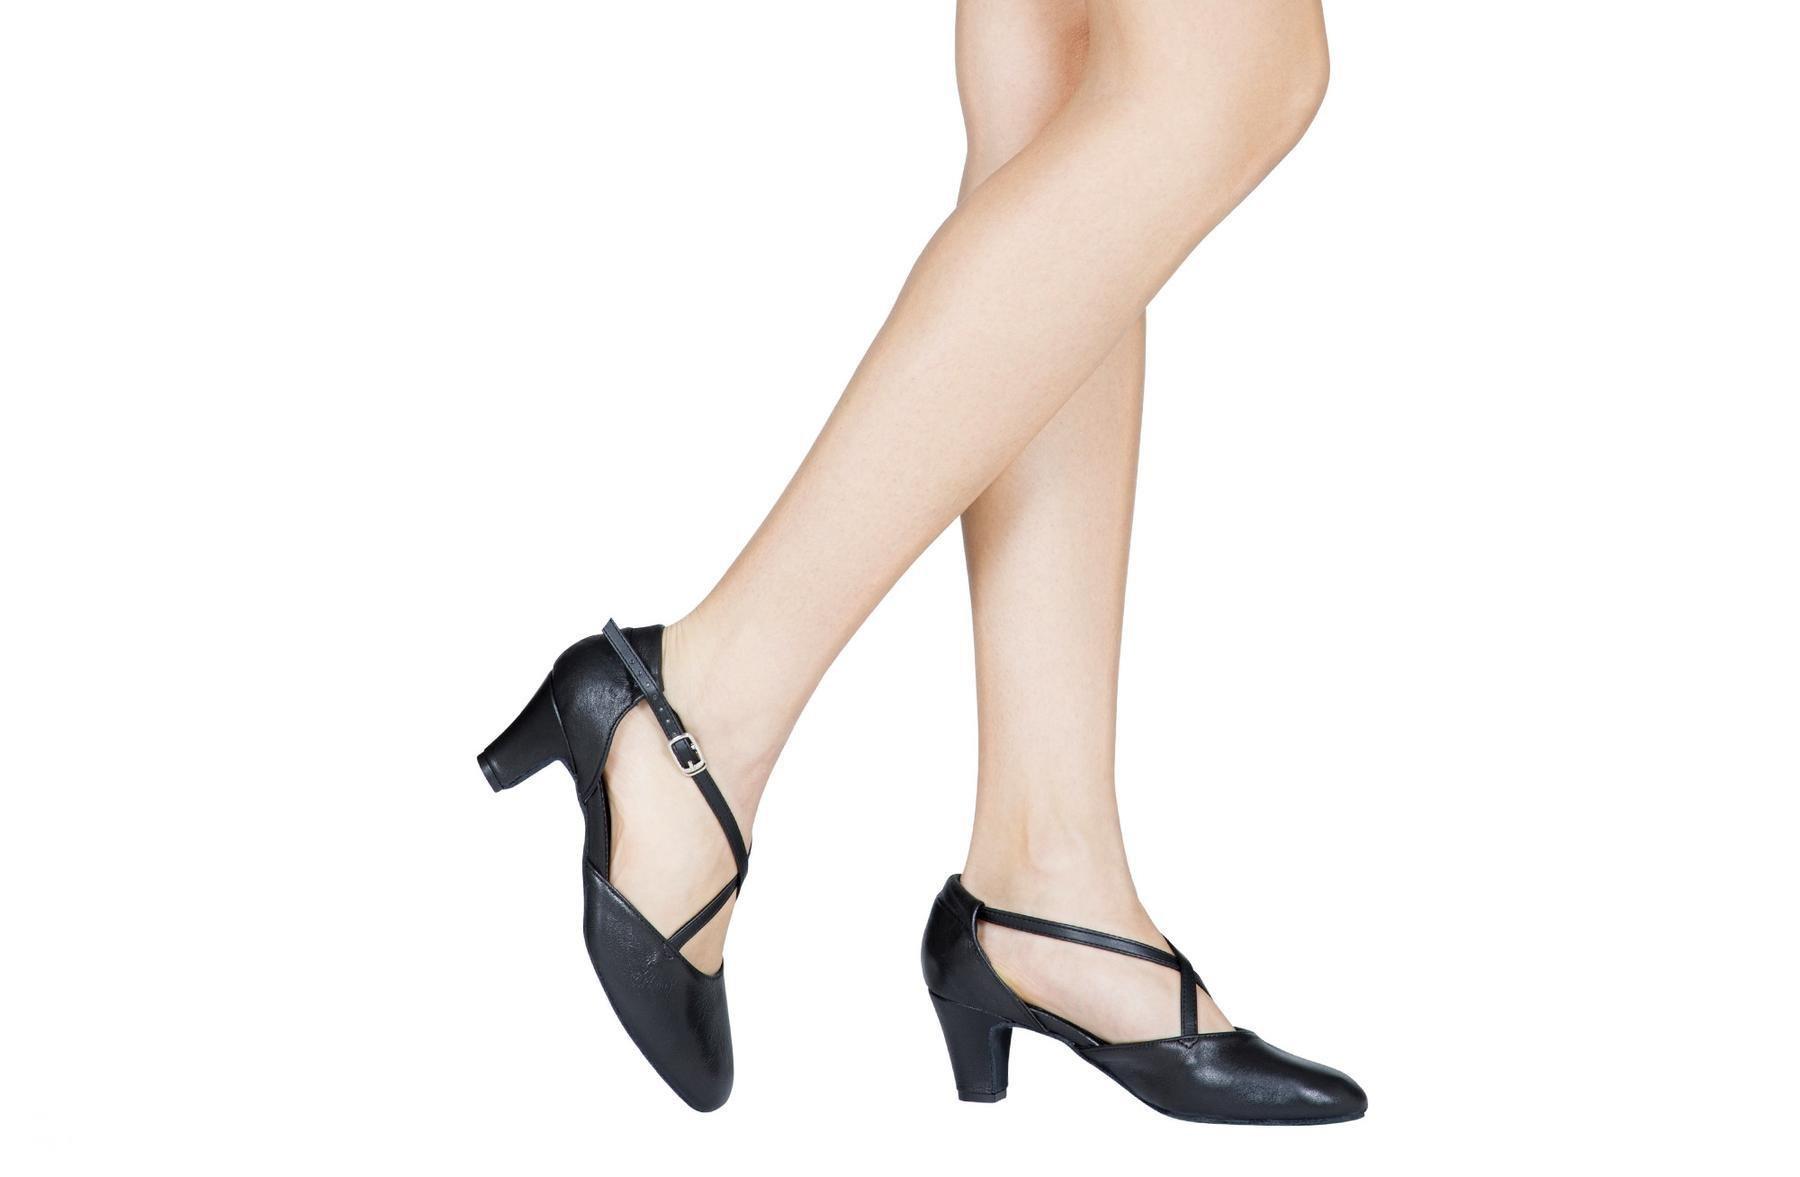 Dancing shoes and studio broadway (cuccarini) in black leather heel 5 cm